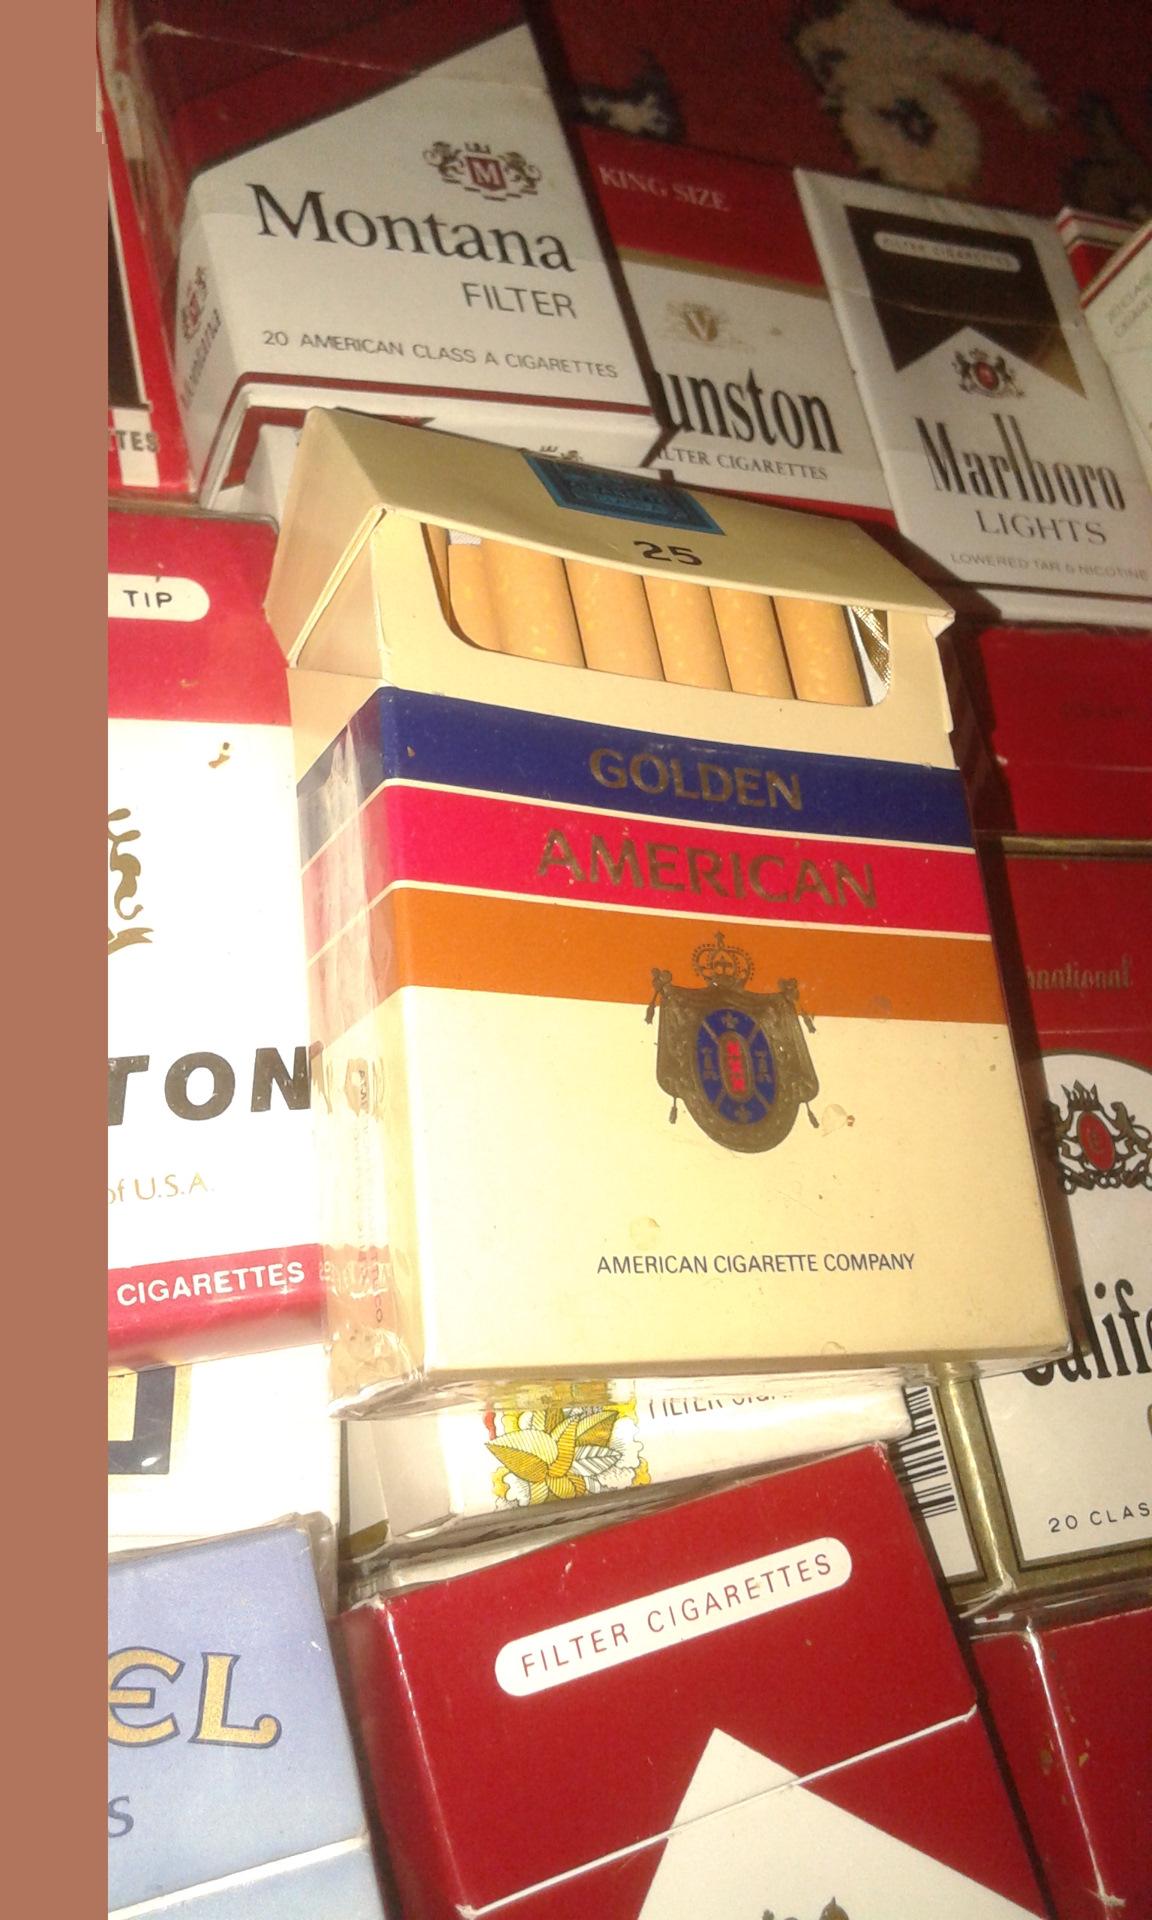 голден американ сигареты 25 штук купить